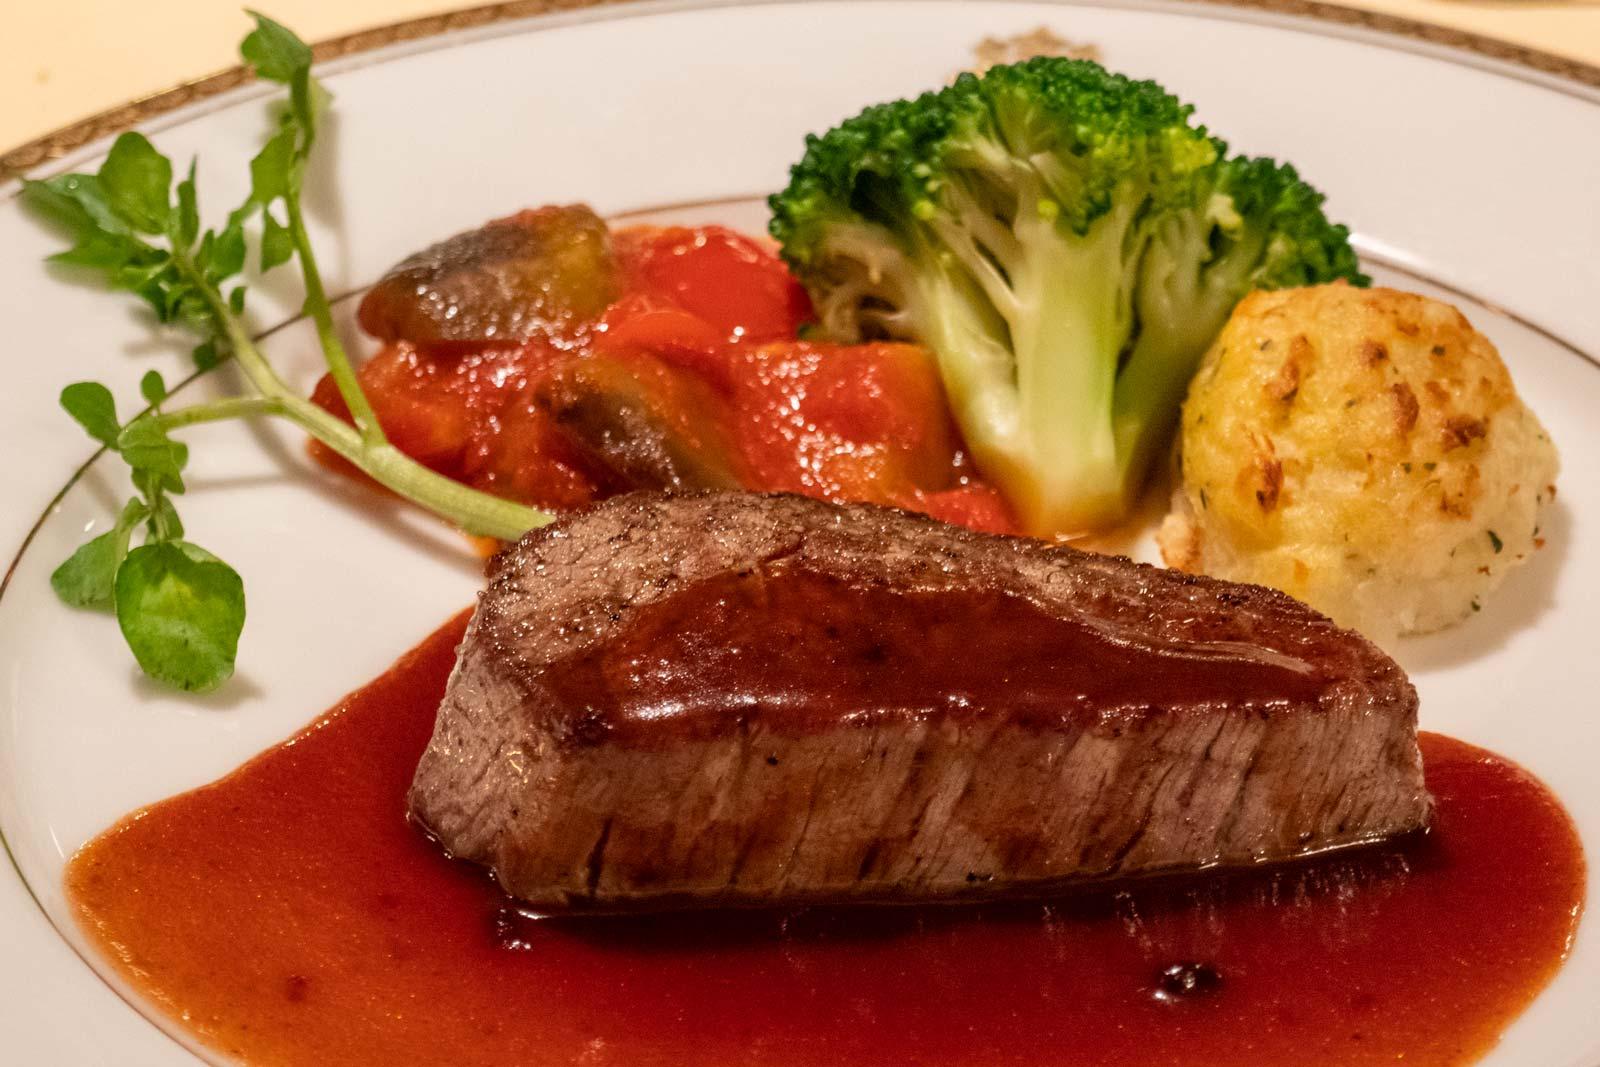 Tochigi-beef-at-the-Kanaya-Hotel-Nikko